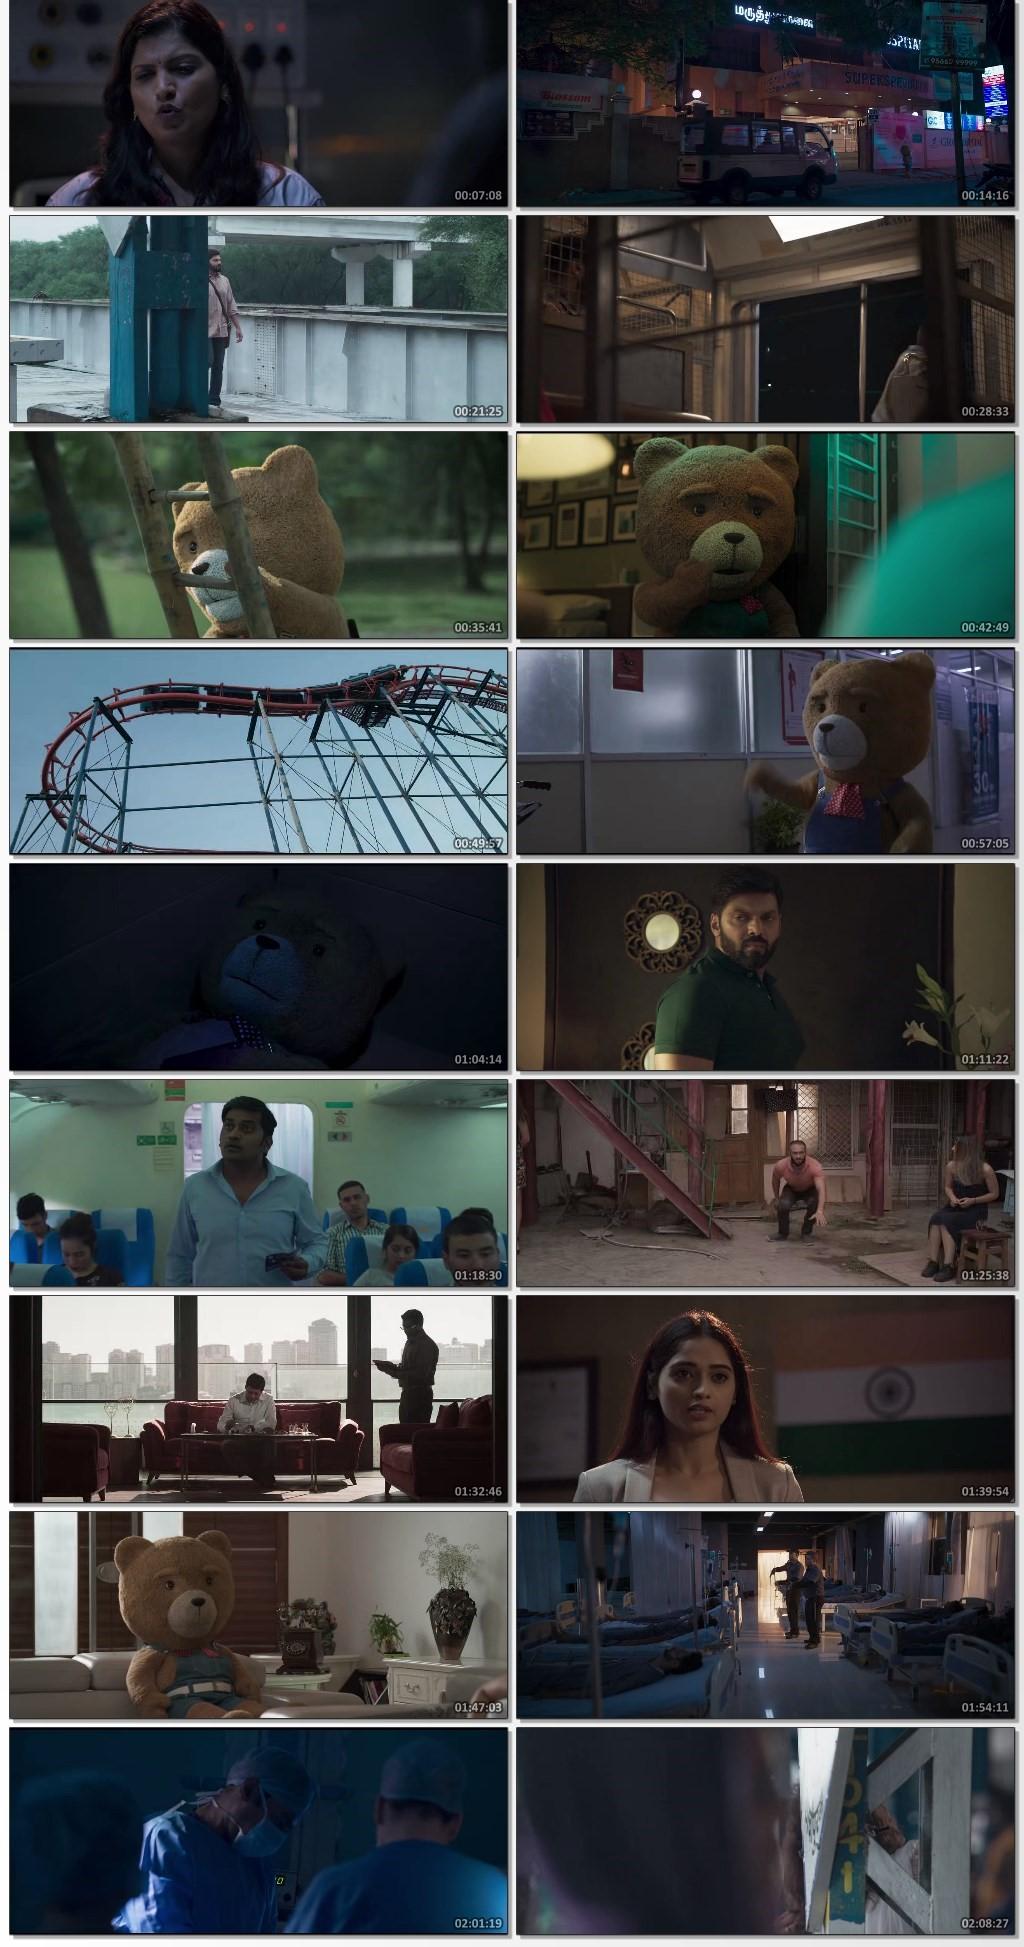 Teddy-2021-UNCUT-Dual-Audio-Hindi-720p-mkv-thumbs